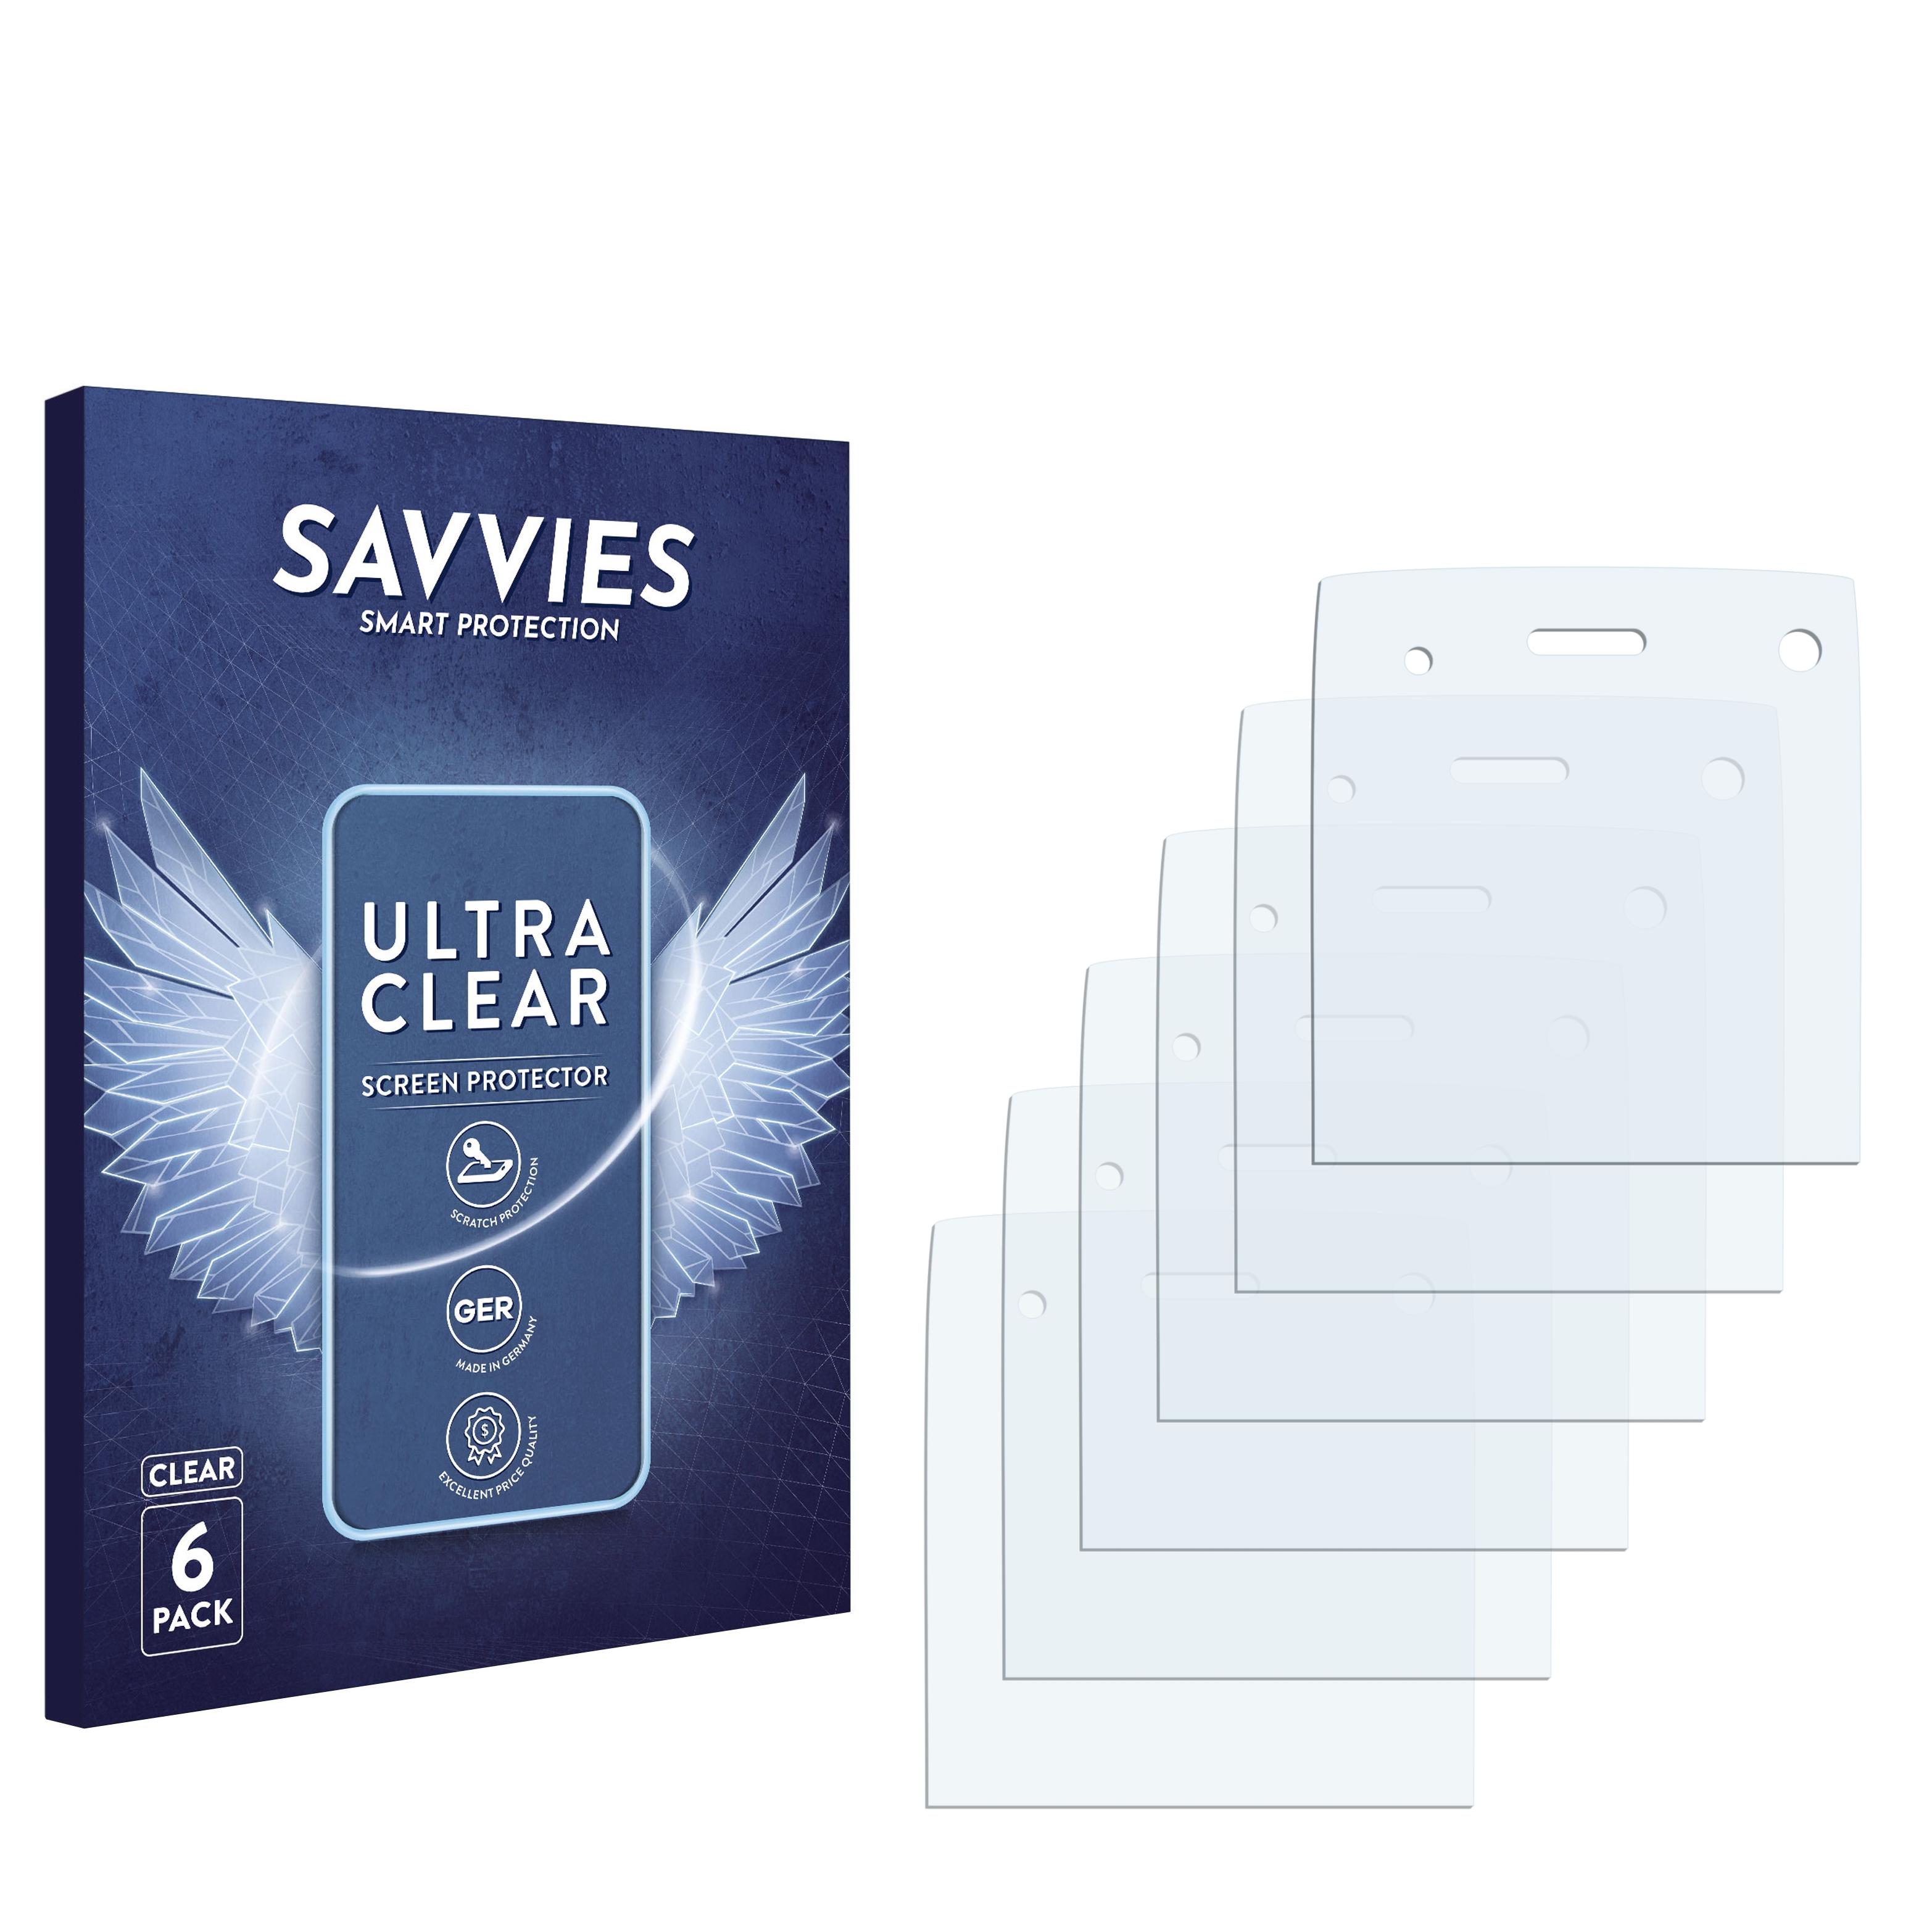 Ochranná fólie Savvies na LG Electronics GW550, 6ks